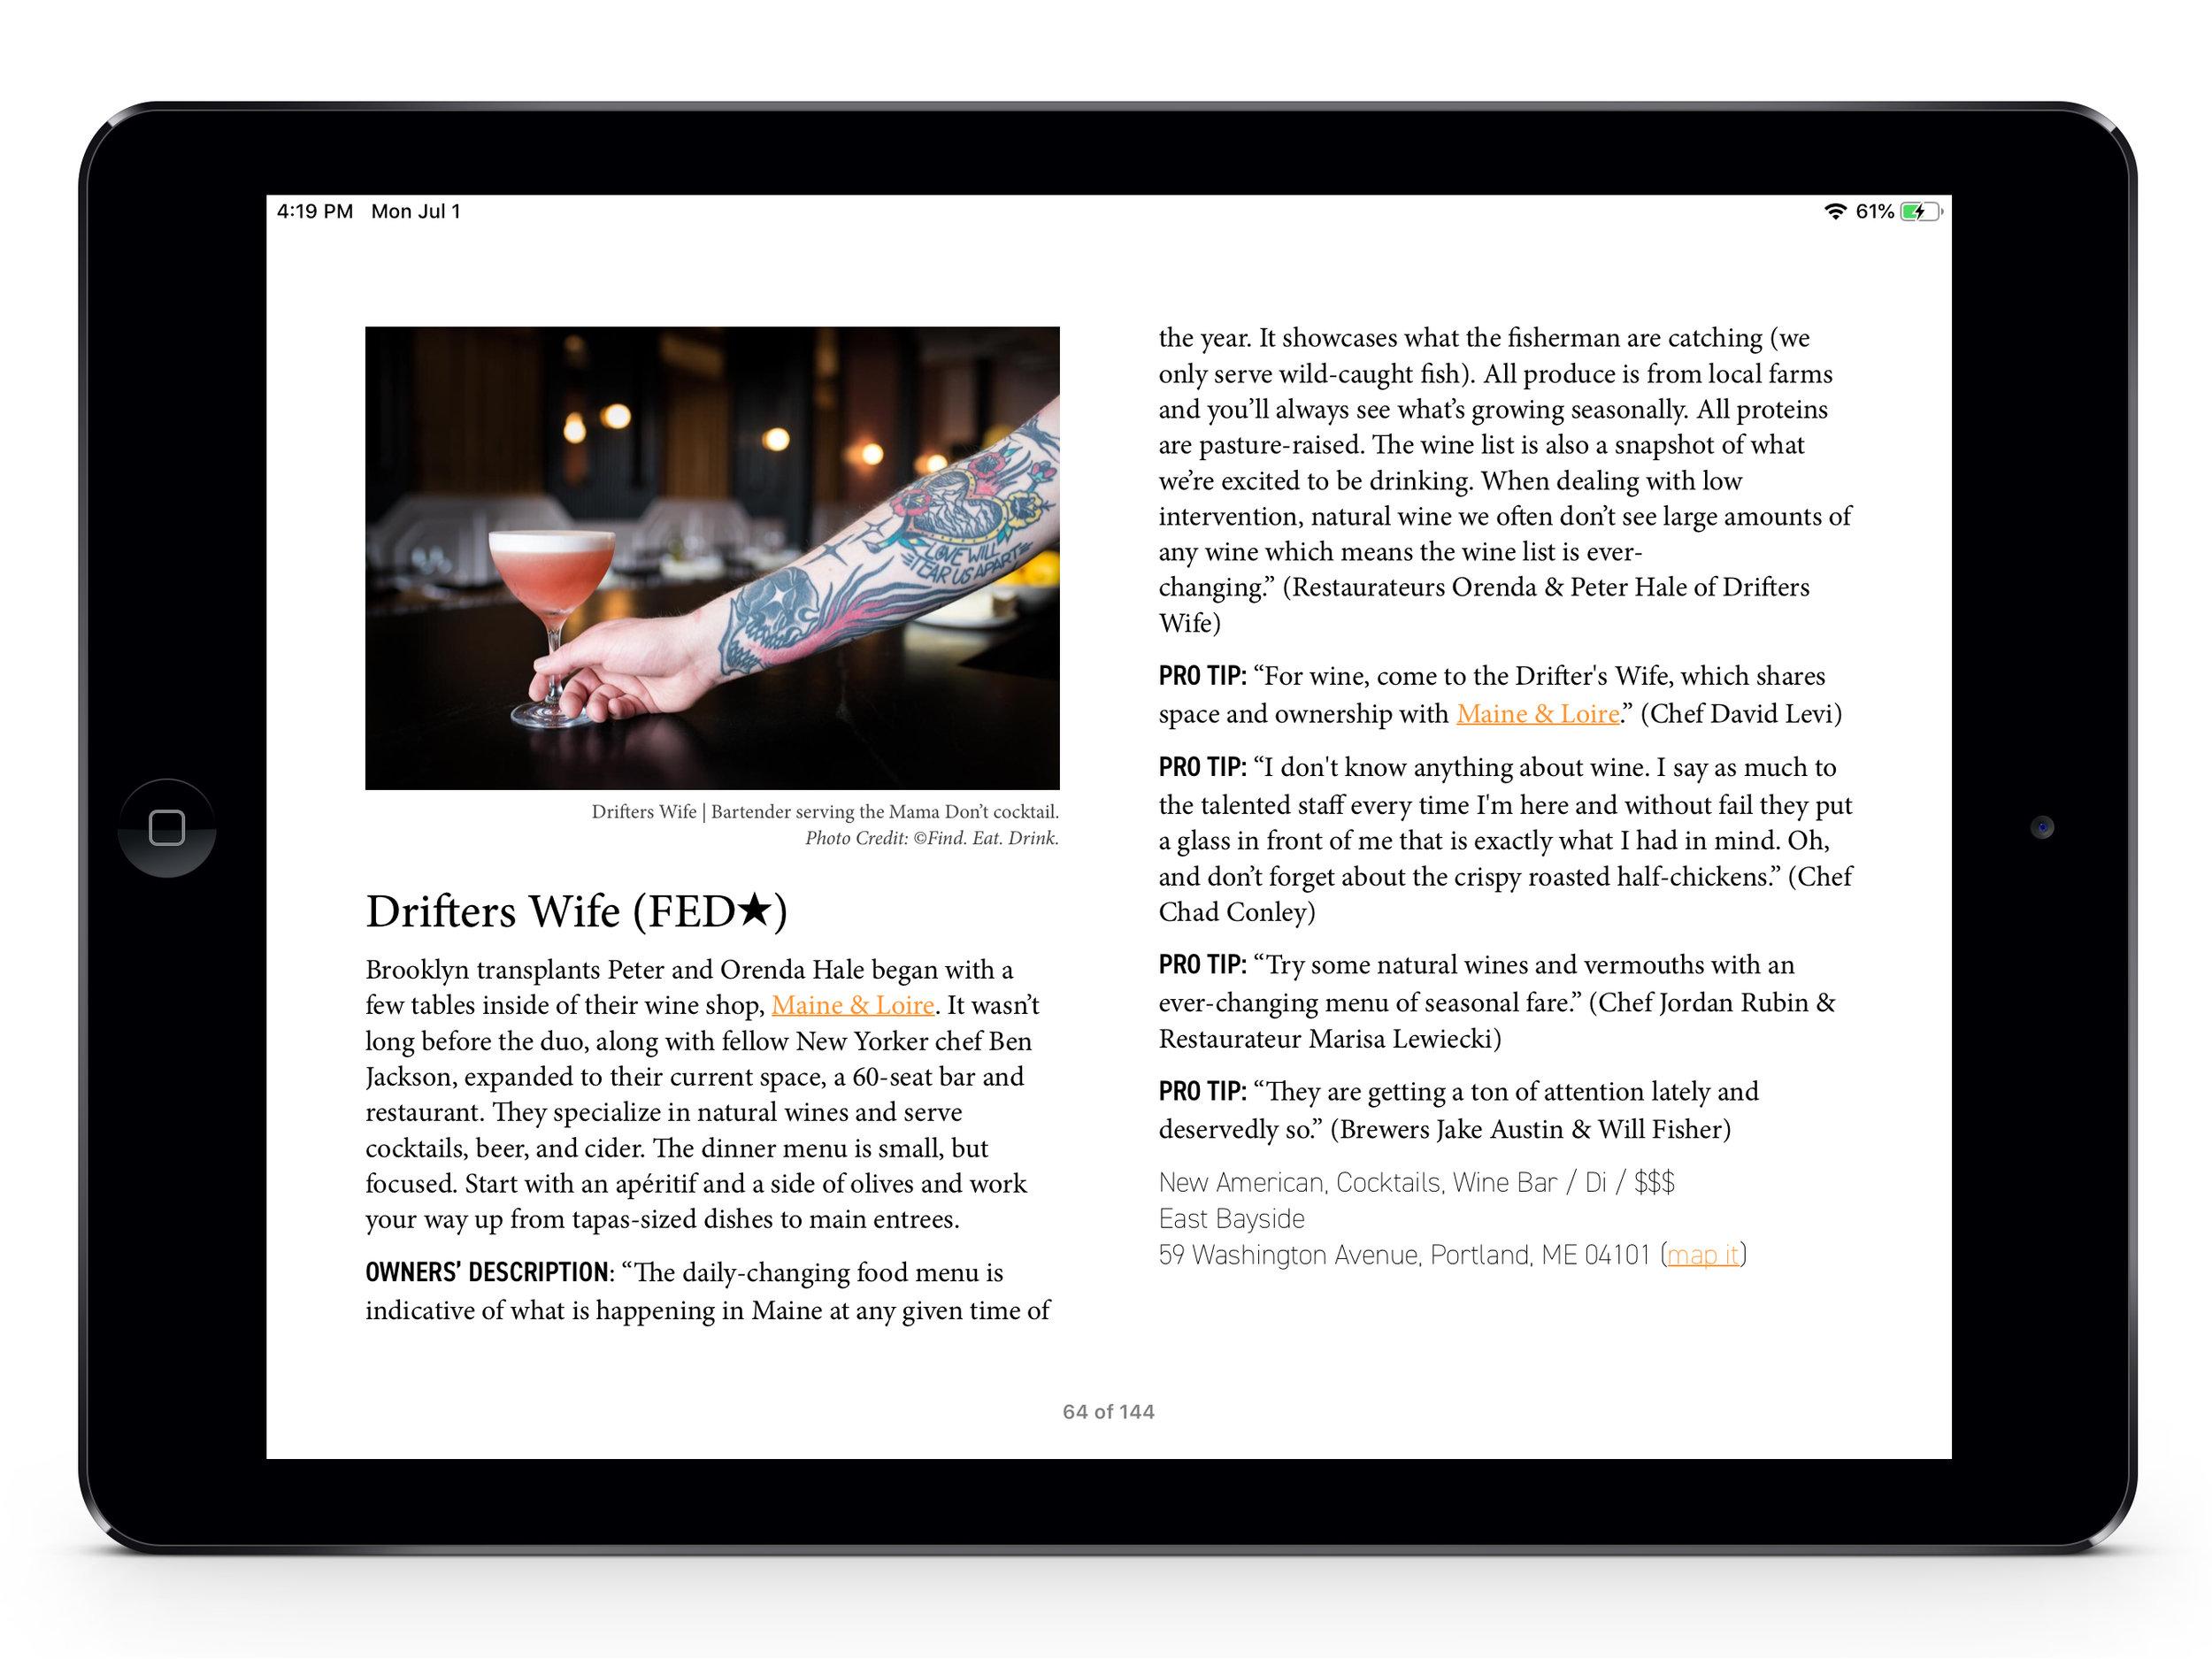 iPadAir_PortlandME_Screenshots_Landscape_1.14.jpg